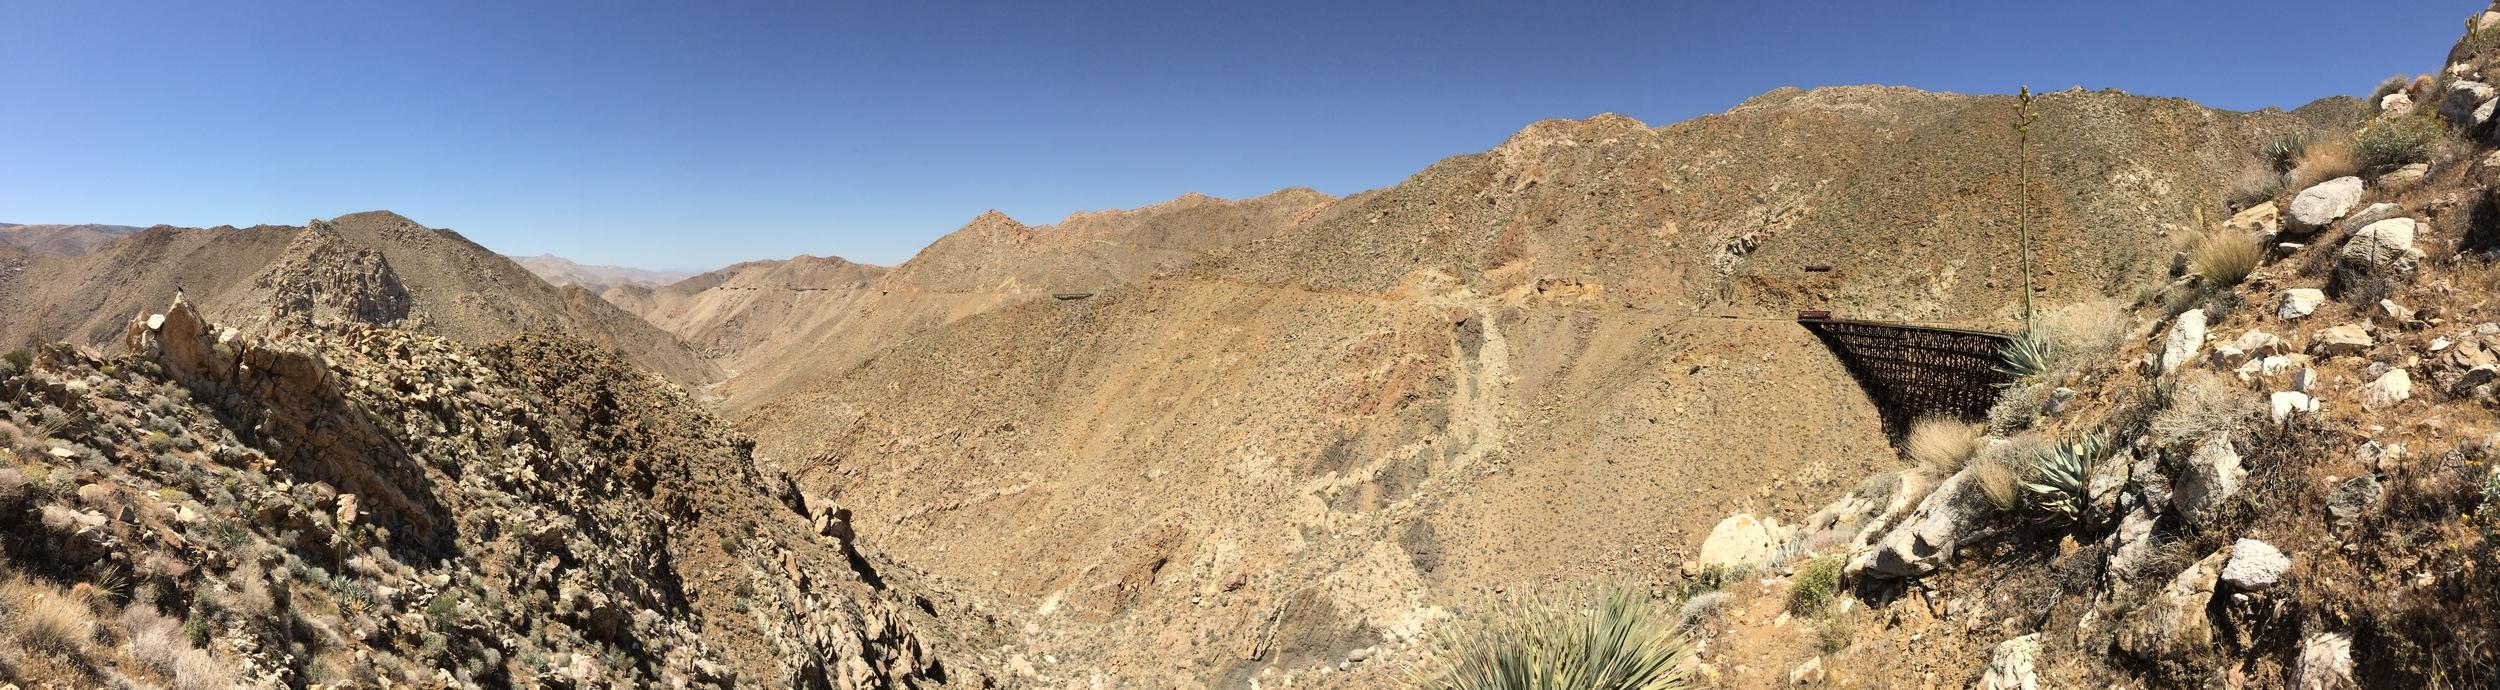 Goat Canyon Trestle, April 2015